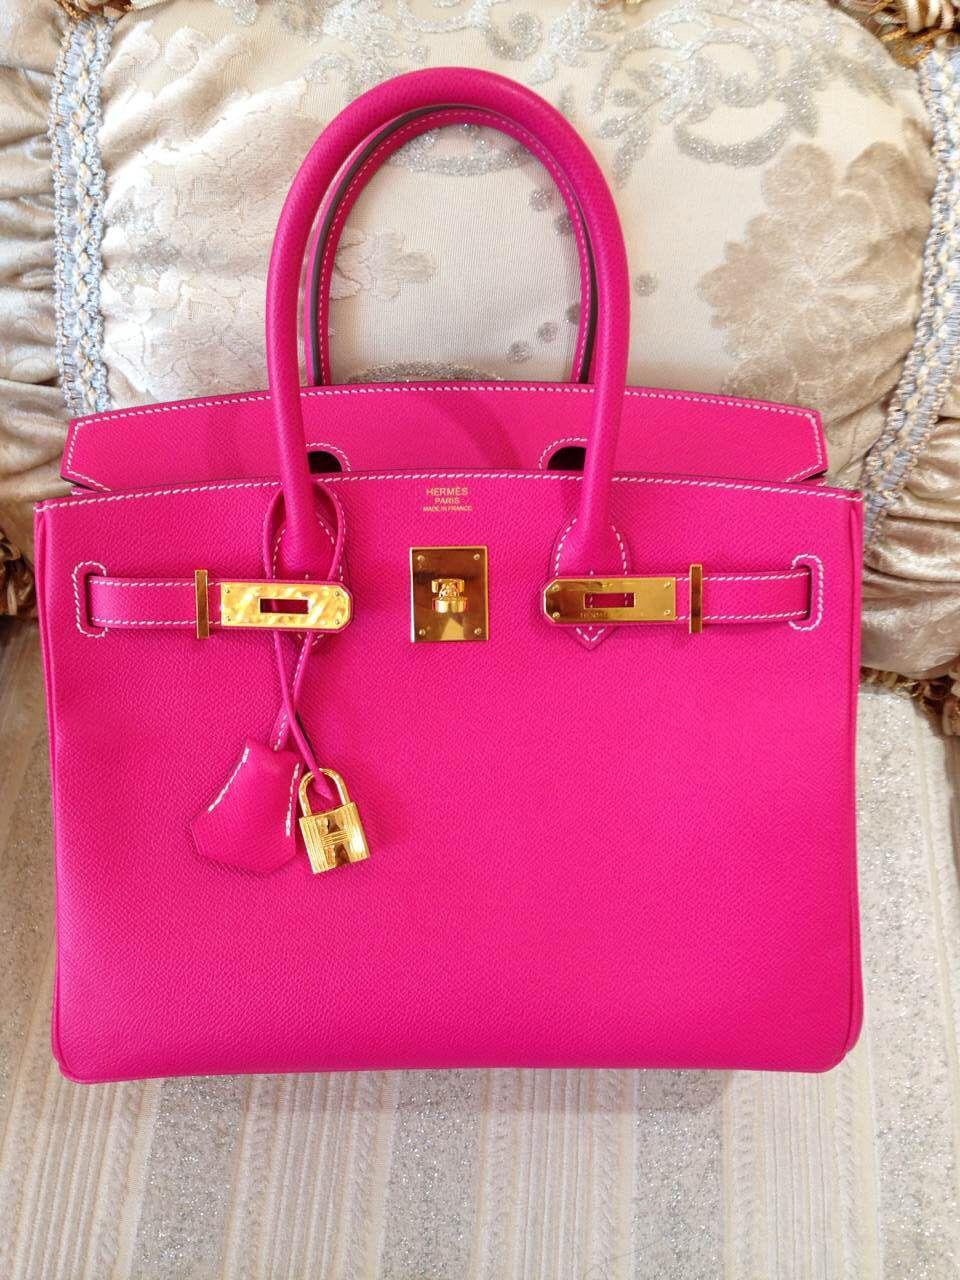 74dc94704664 Candy Color Pink Hermes Birkin Togo 30cm with Gold Hardware E5 Q Engraved  Stamp